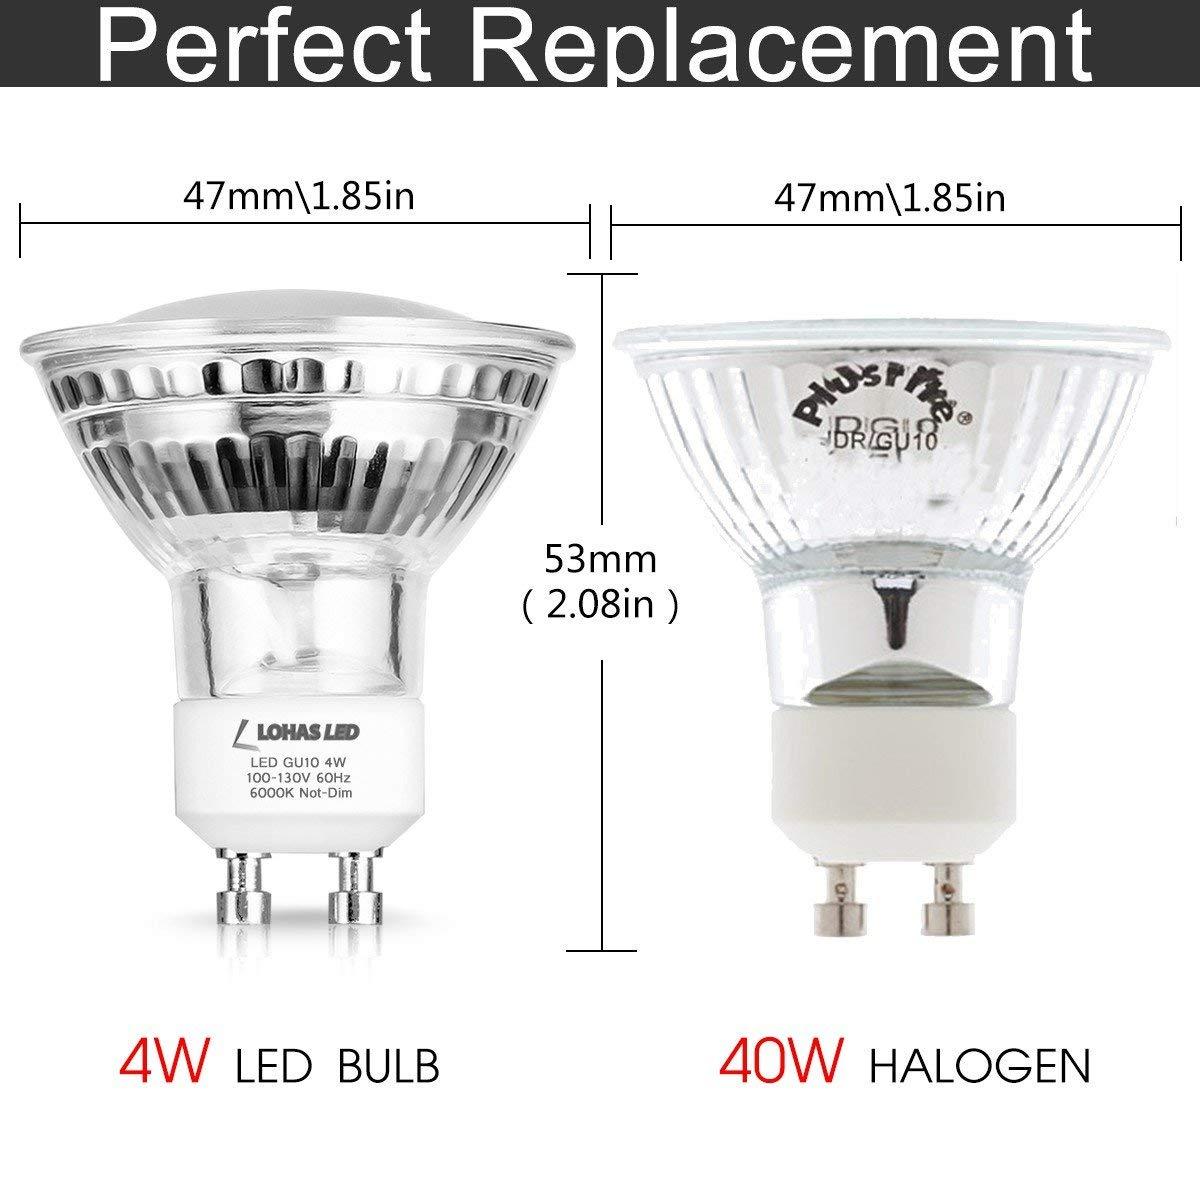 Us 17 59 12 Off Gu10 Led Light Bulb Track Lighting 40w Equivalent Daylight White 6000k 4w Spotlight 420lm Lamp For Pedant Fixtures 6pack In